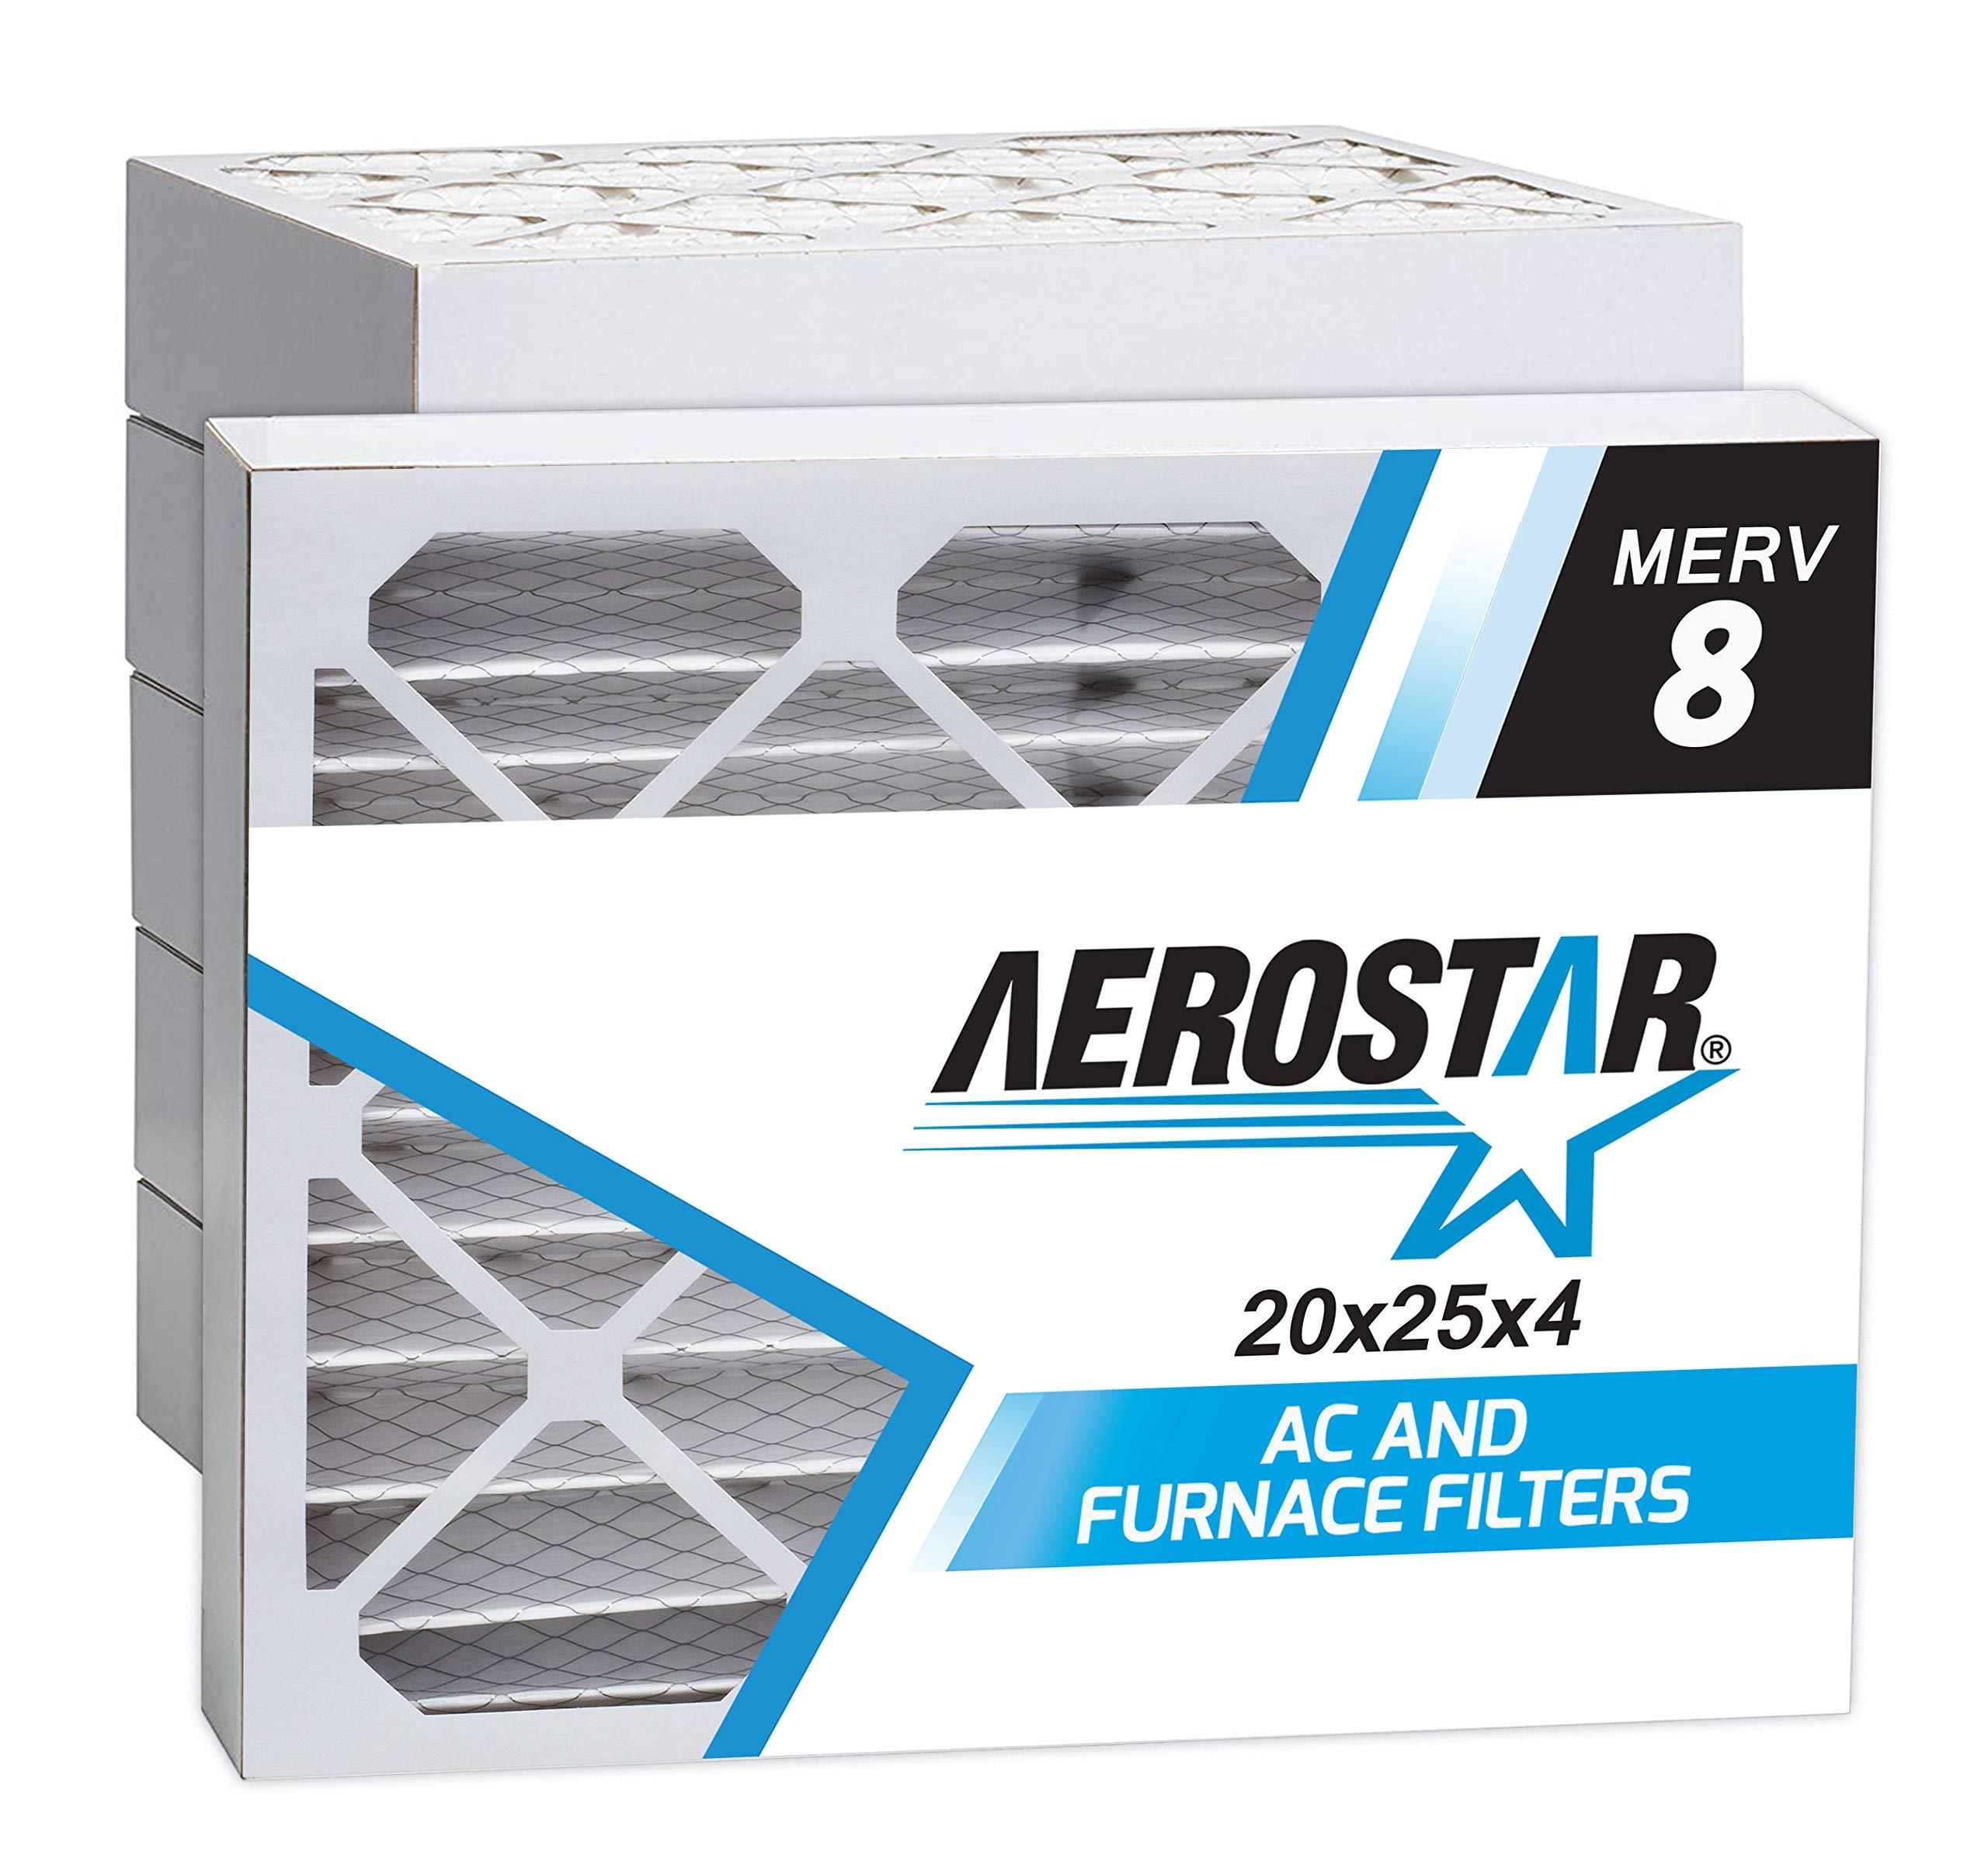 Aerostar 20x25x4 MERV 8 Pleated Air Filter, Made in the USA 19 1/2'' x 24 1/2'' x 3 3/4'', 6-Pack